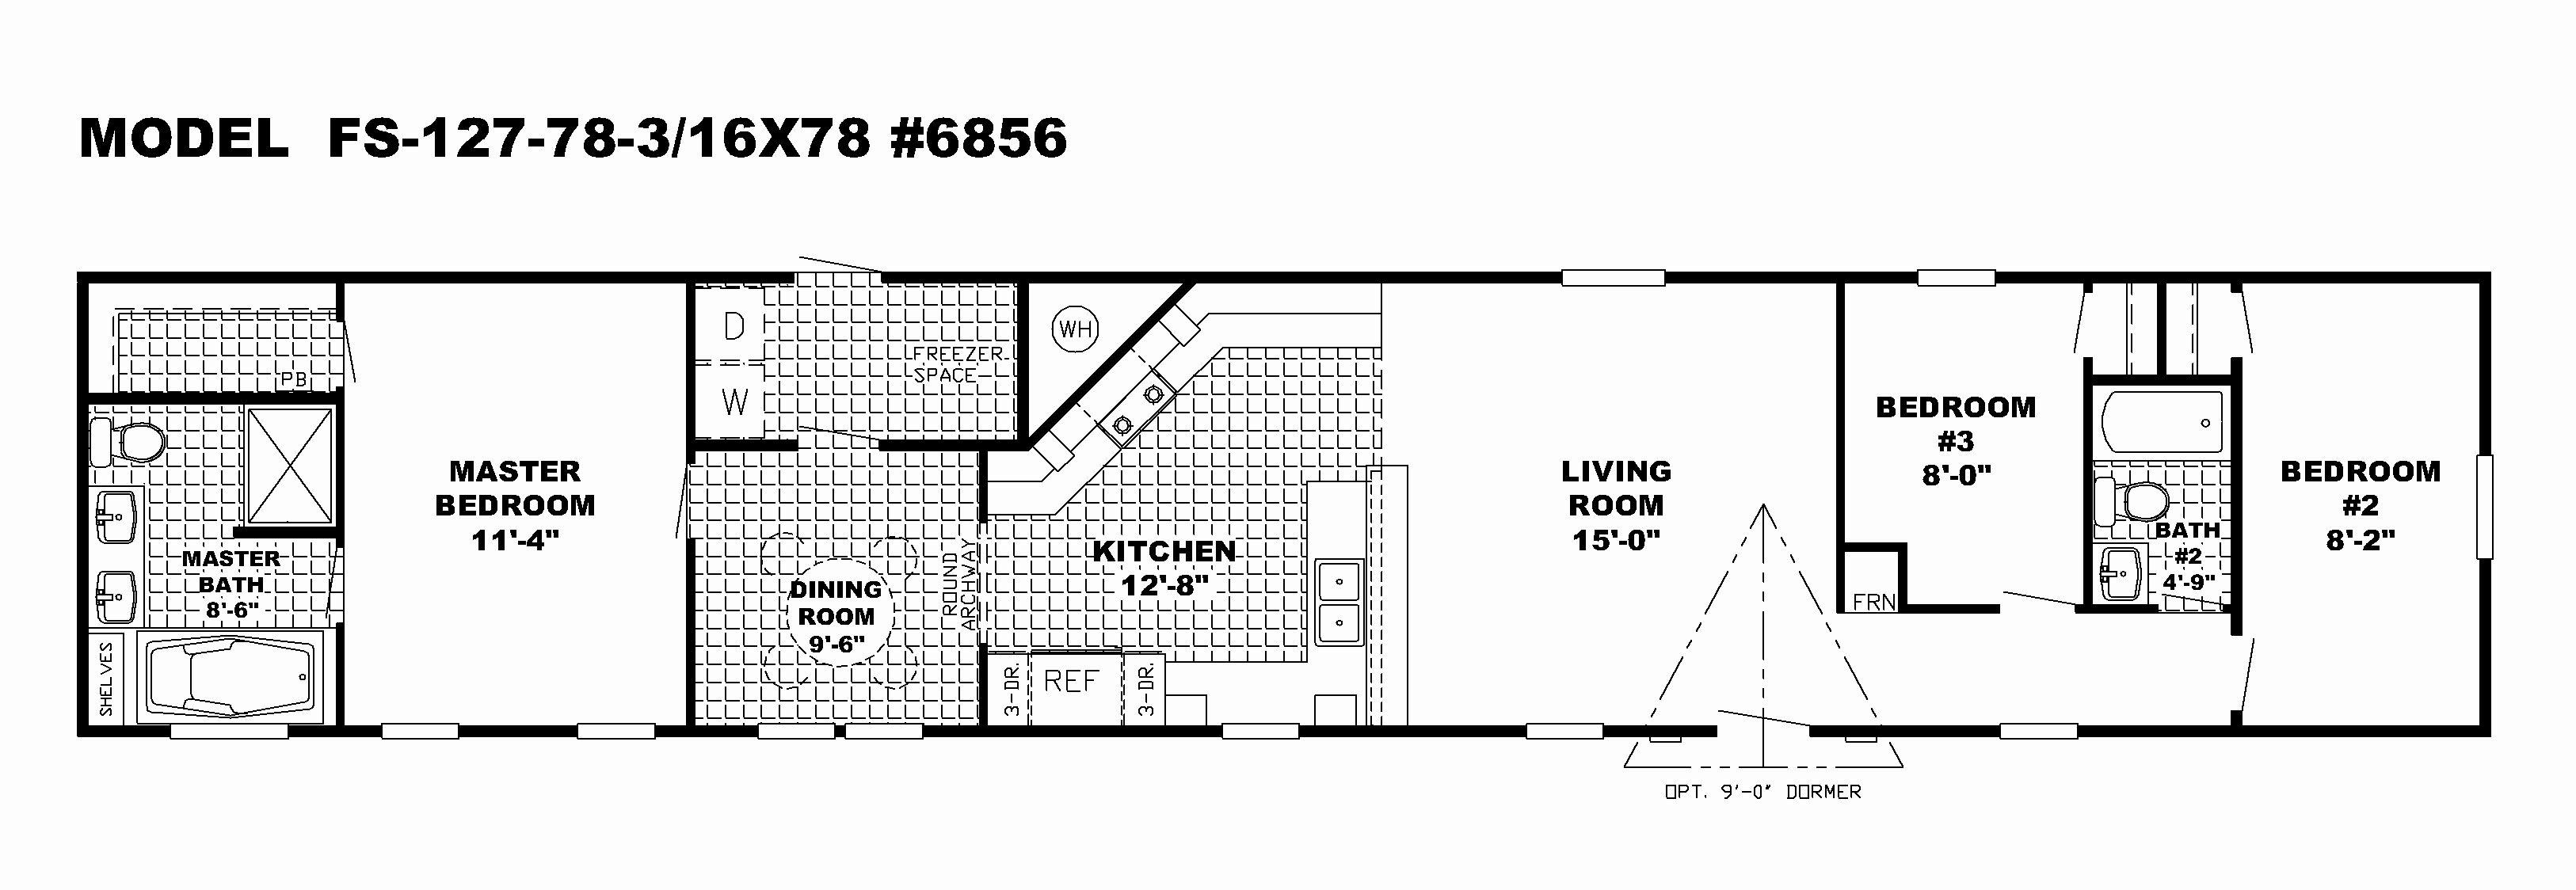 50 Luxury 14x40 Cabin Floor Plans - Home Plans Samples ...